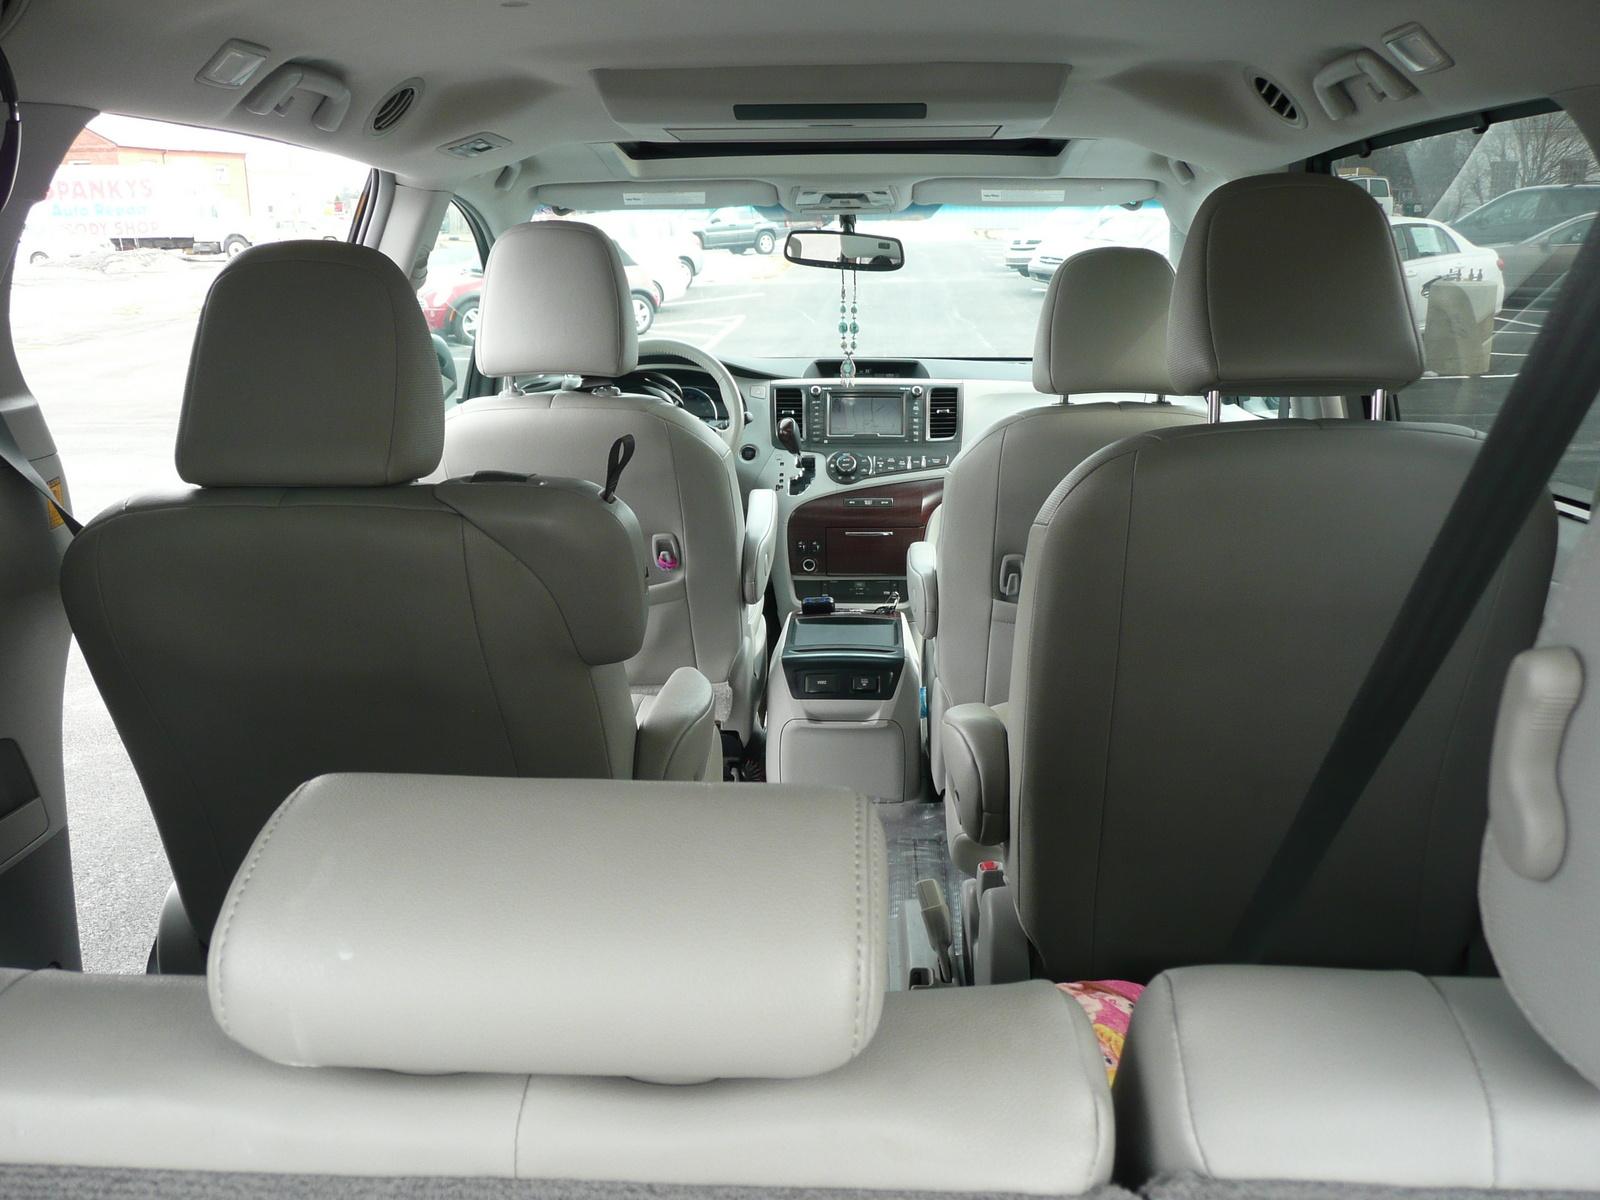 2011 Toyota Sienna Pictures Cargurus